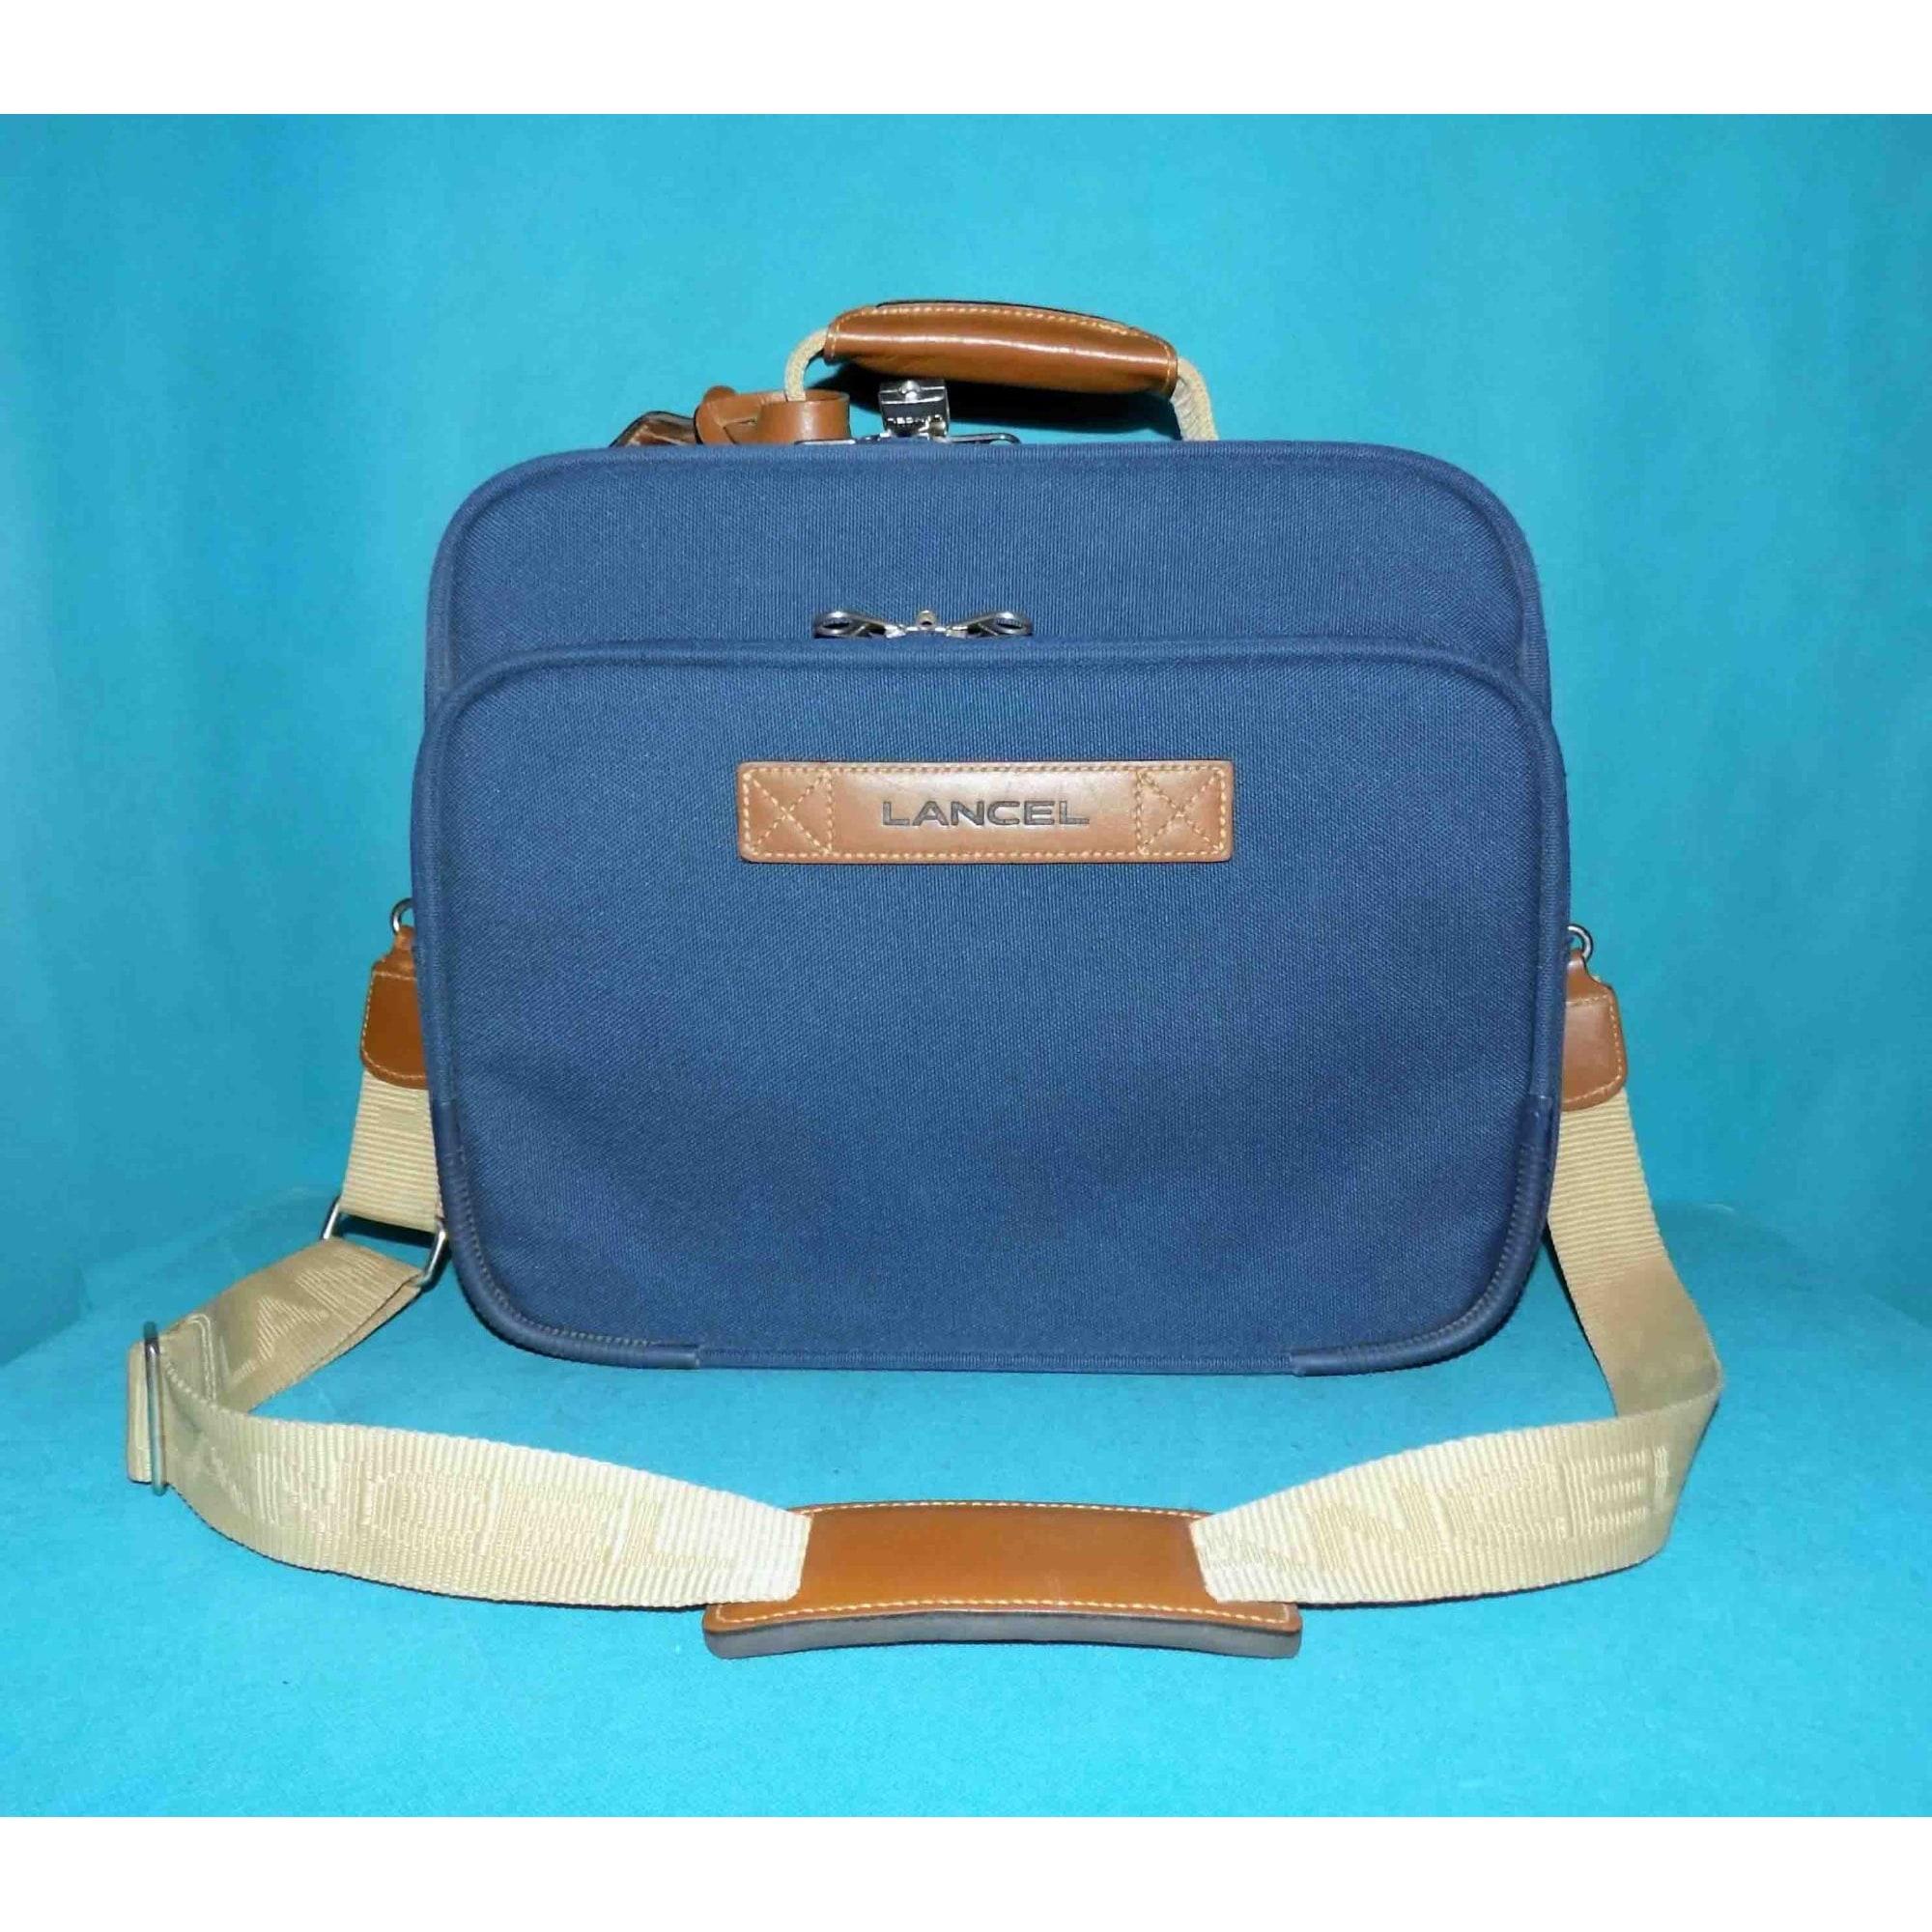 Mallette LANCEL Bleu, bleu marine, bleu turquoise